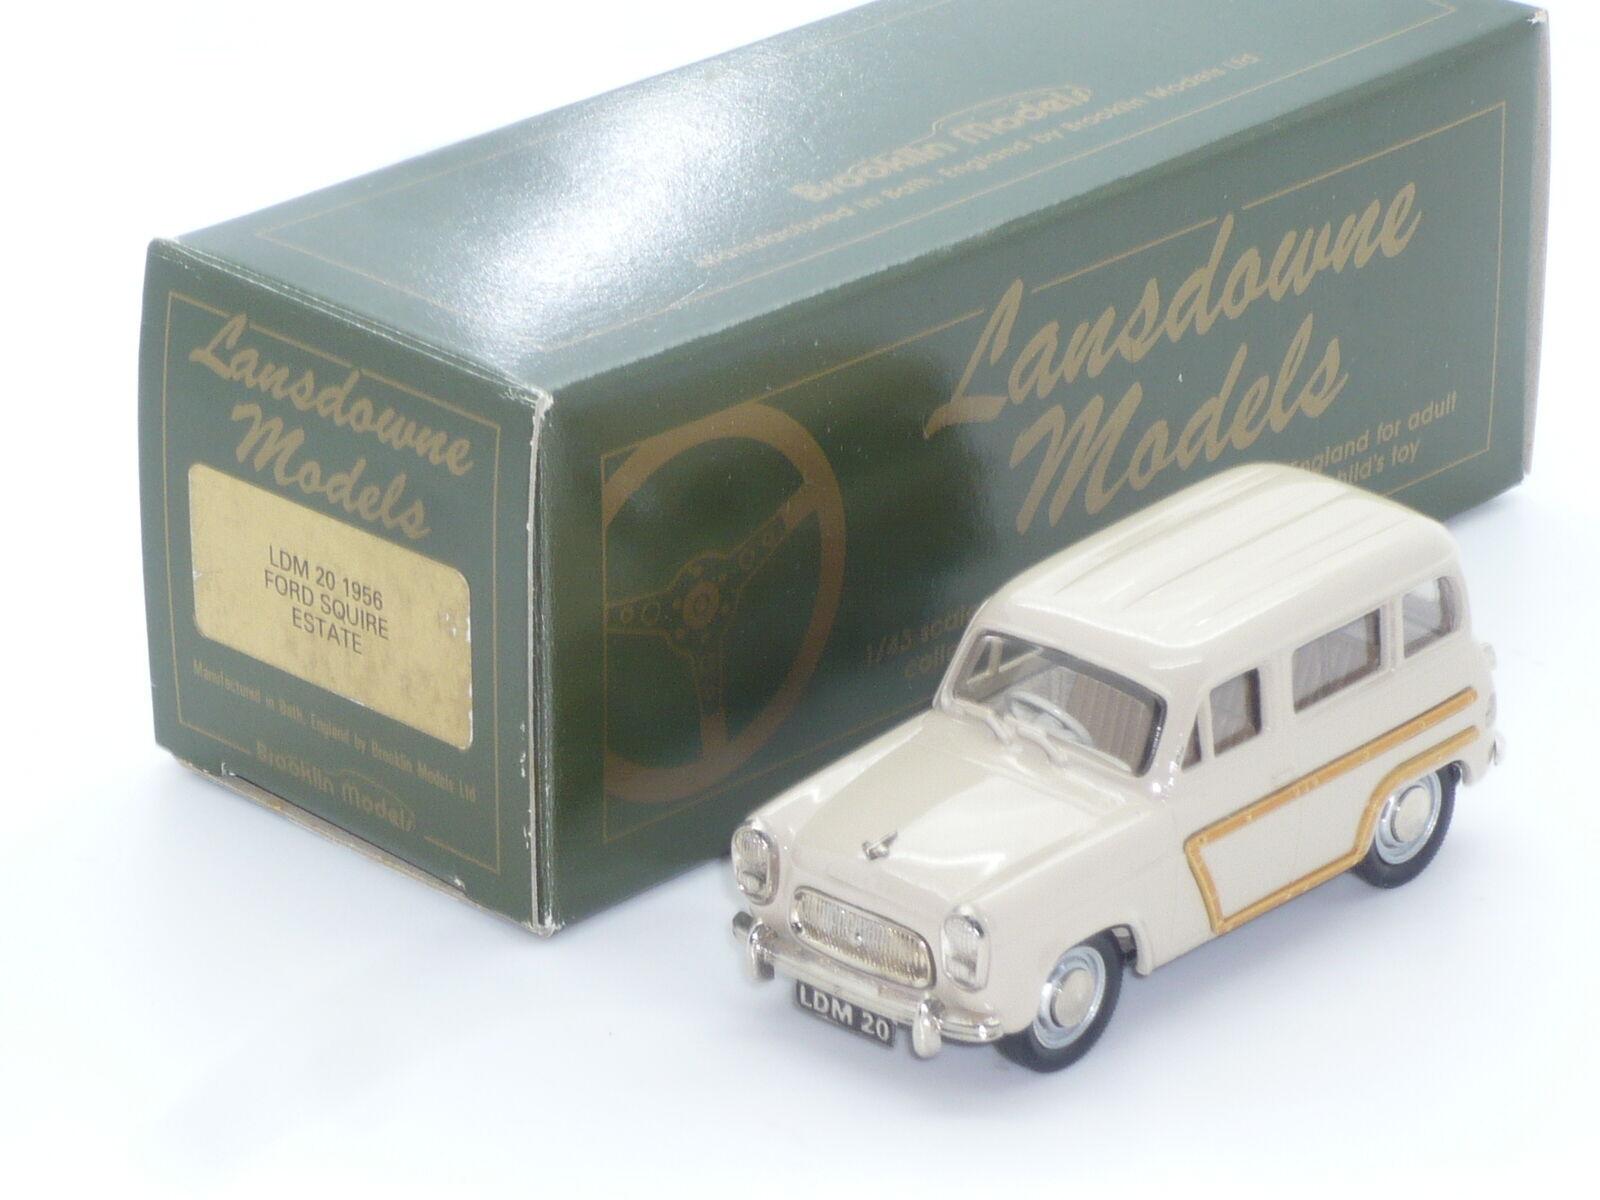 New 1 43 43 43 Lansdowne Models LDM20 1956 Ford Squire Estate Handbuilt Brooklin 0ea7e4